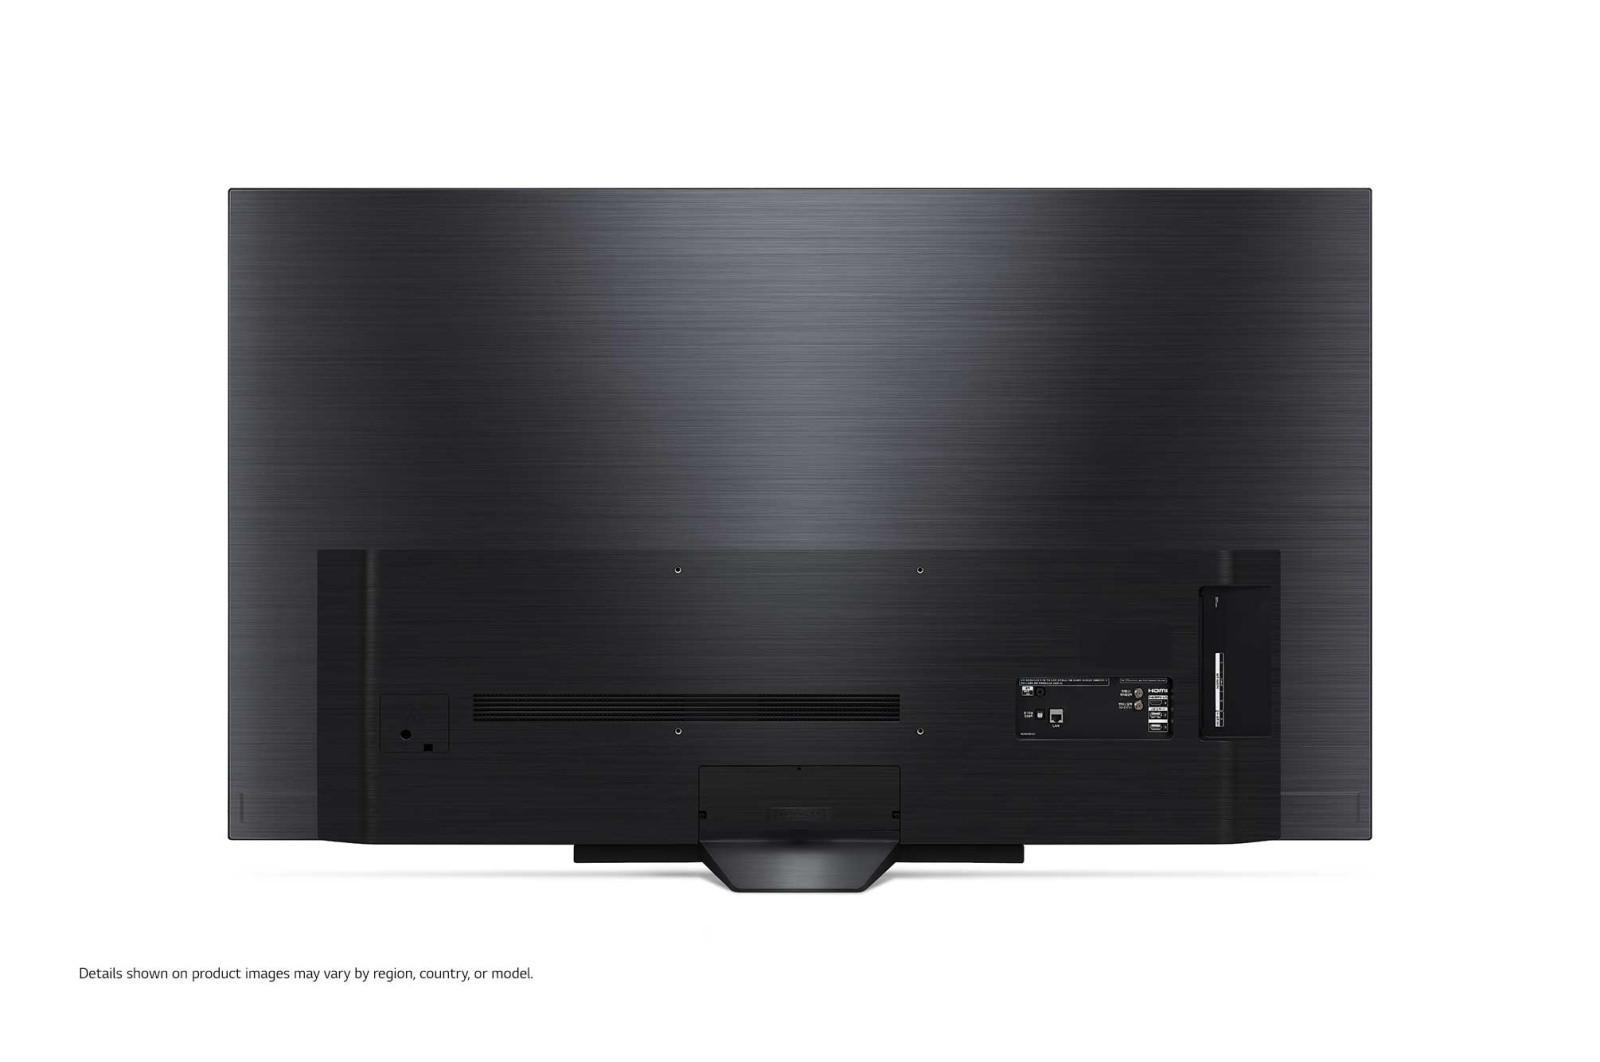 Smart Tivi OLED LG 55 inch 55B9PTA 4K UHD